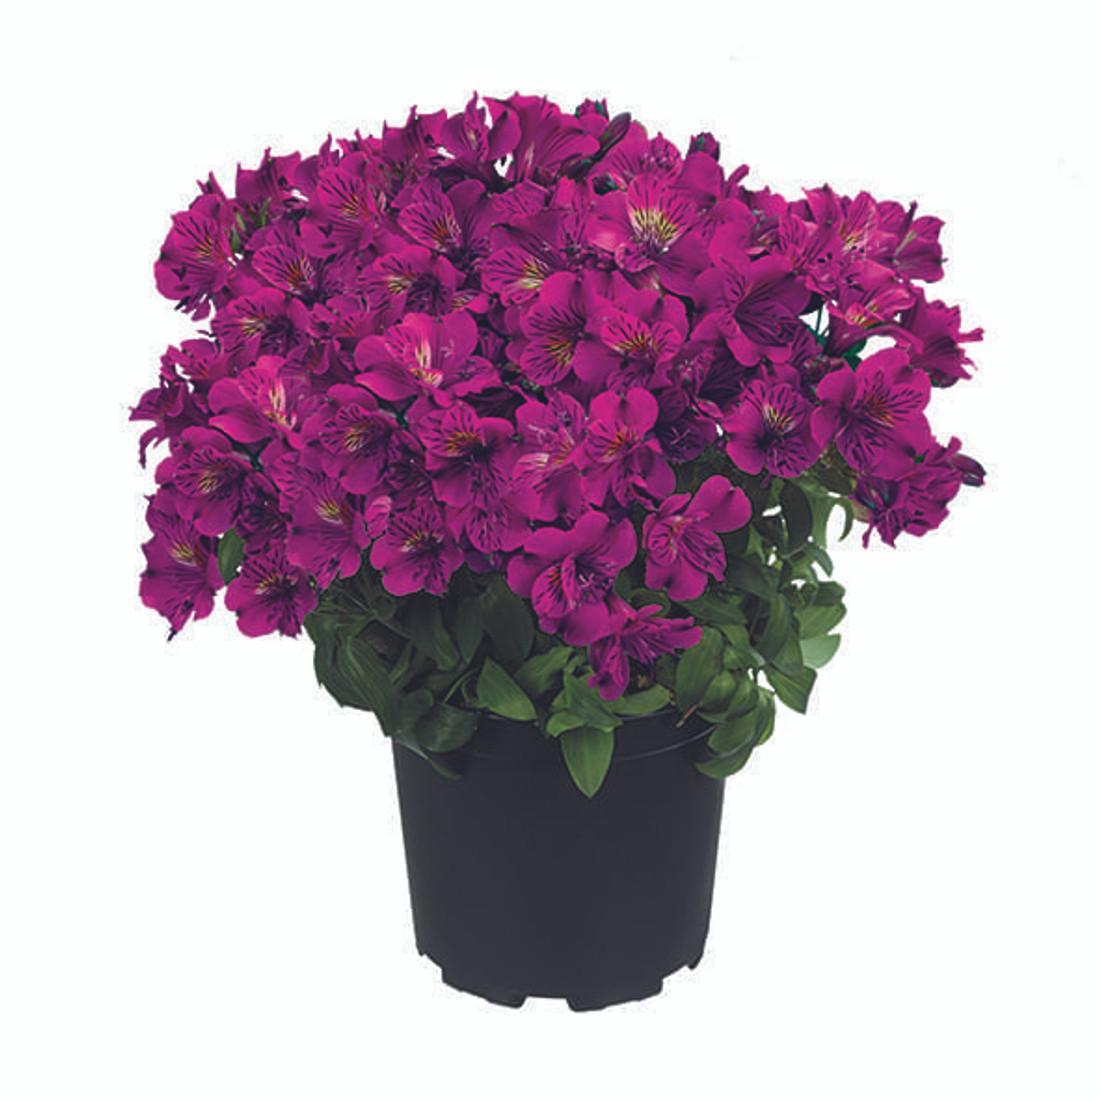 Alstroemeria Princess Lilies® 'Tamara'